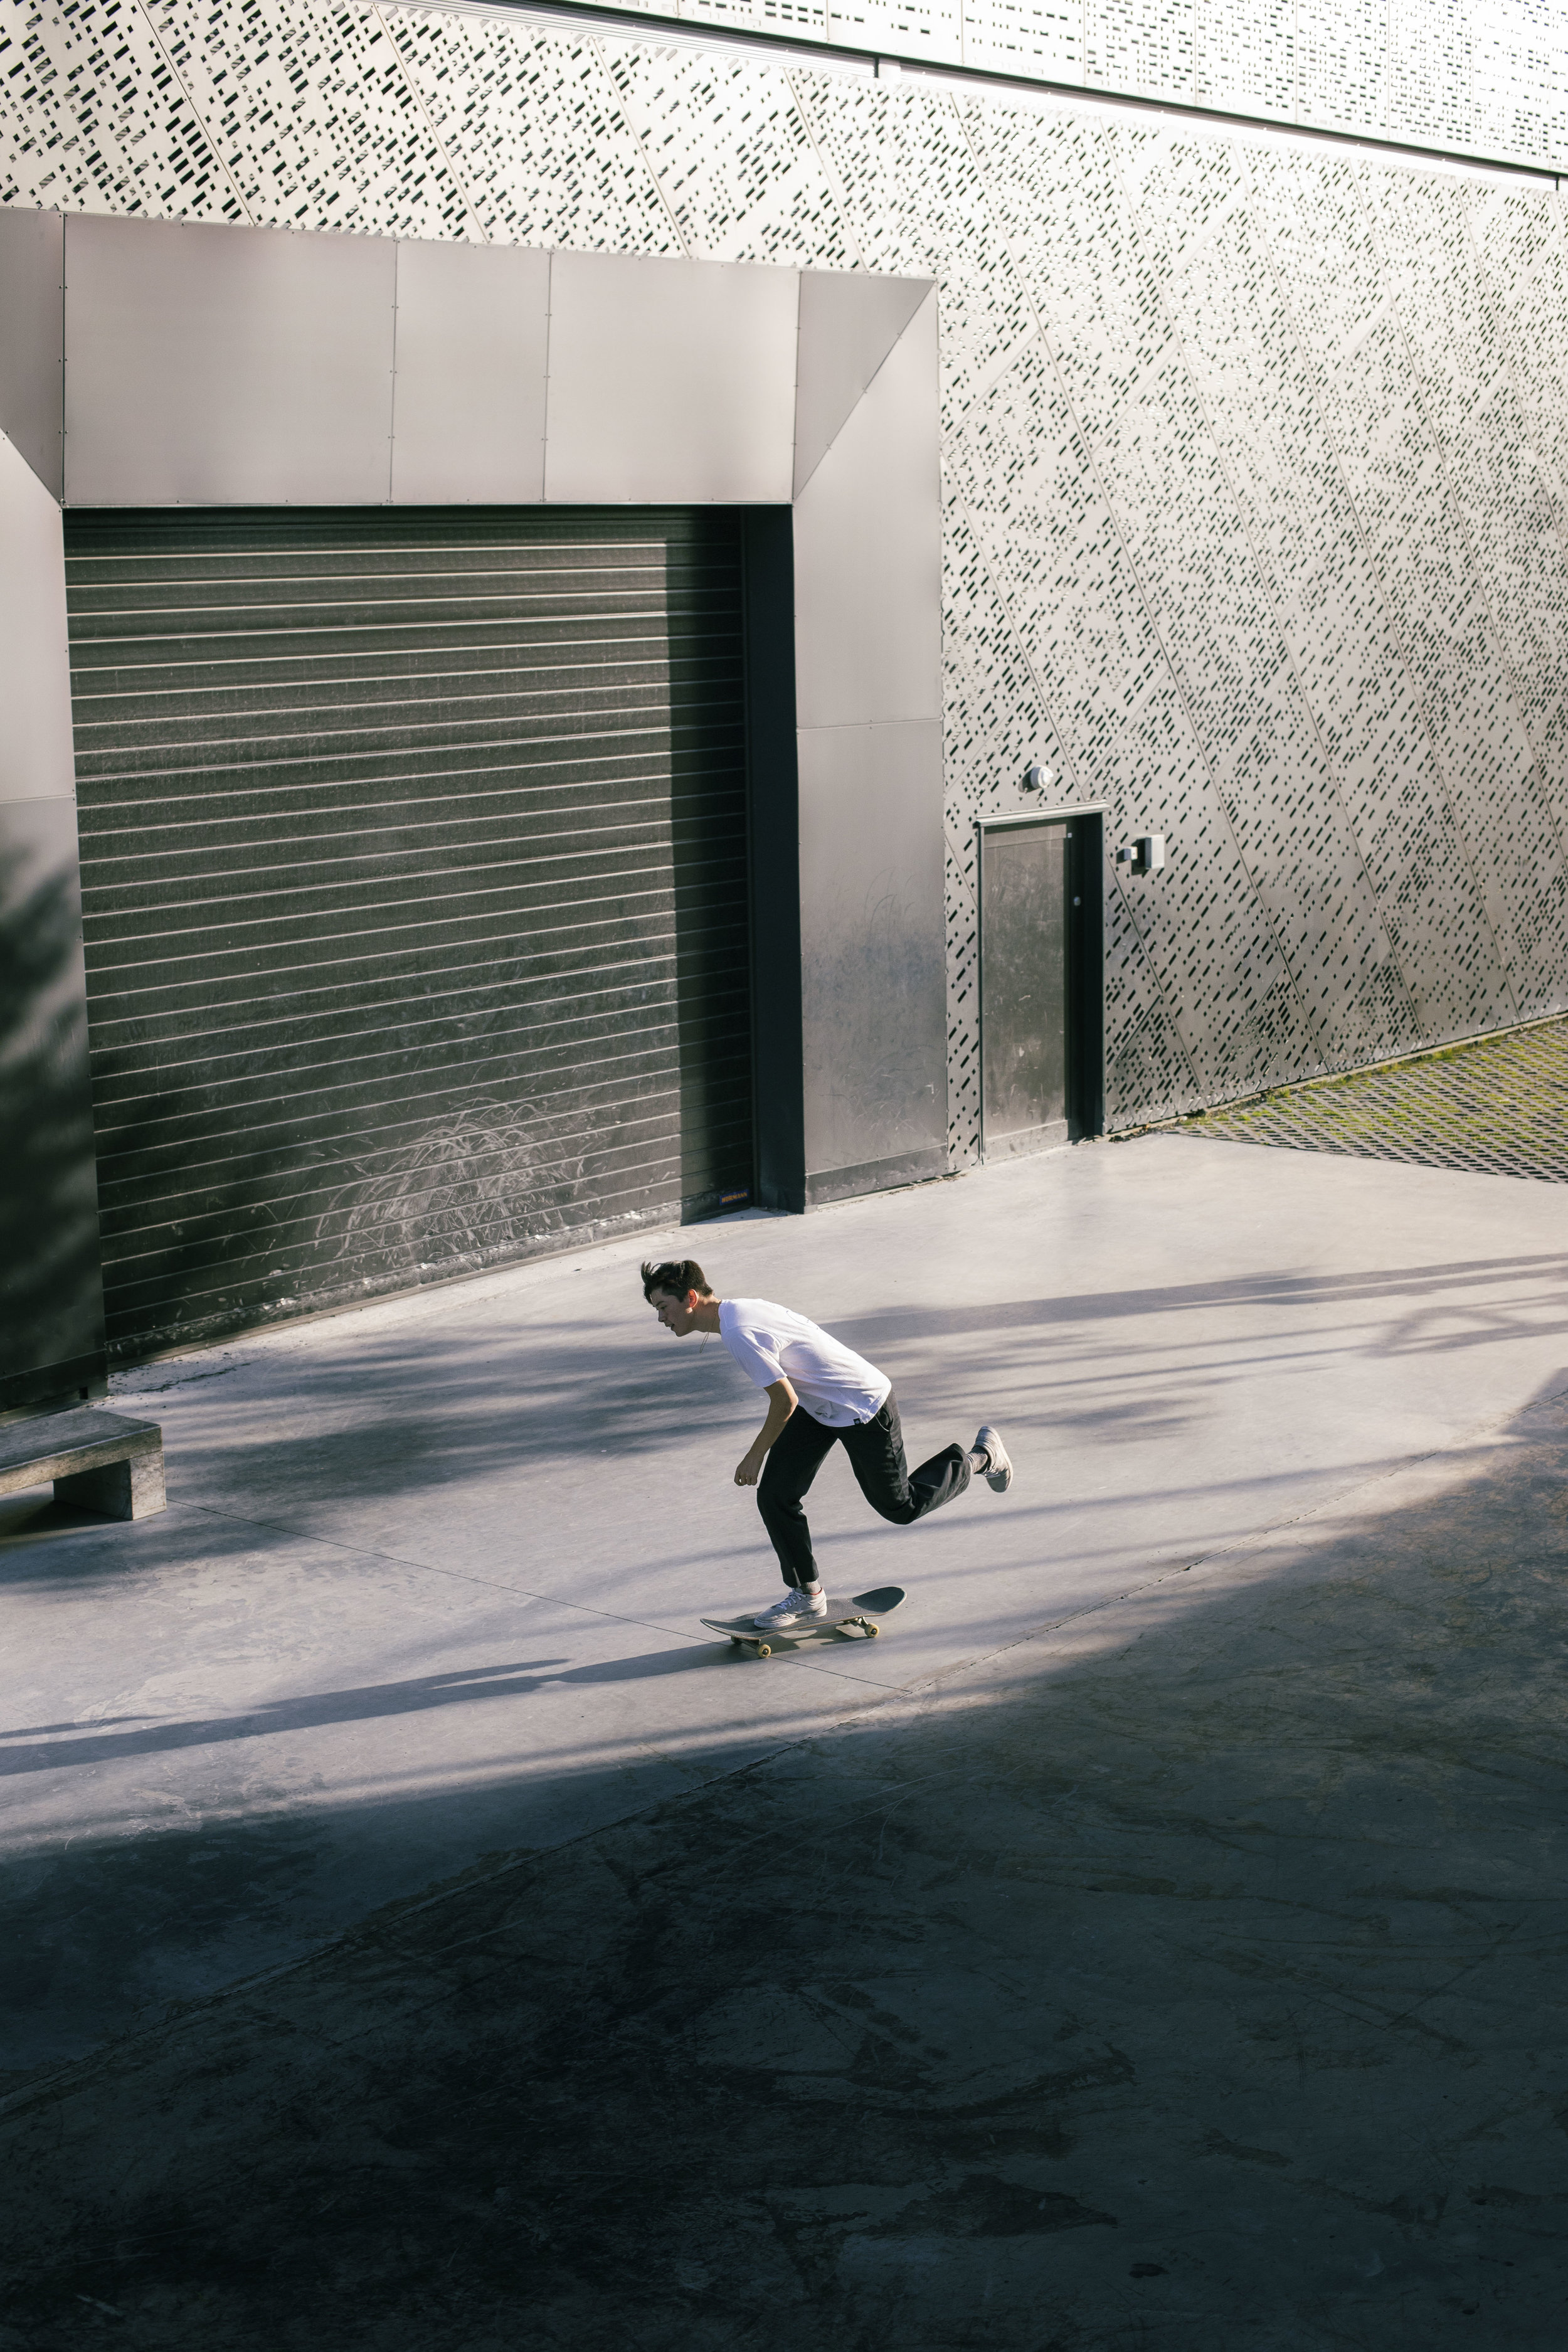 Skate_sebastianbjerkvik-np_13.jpg